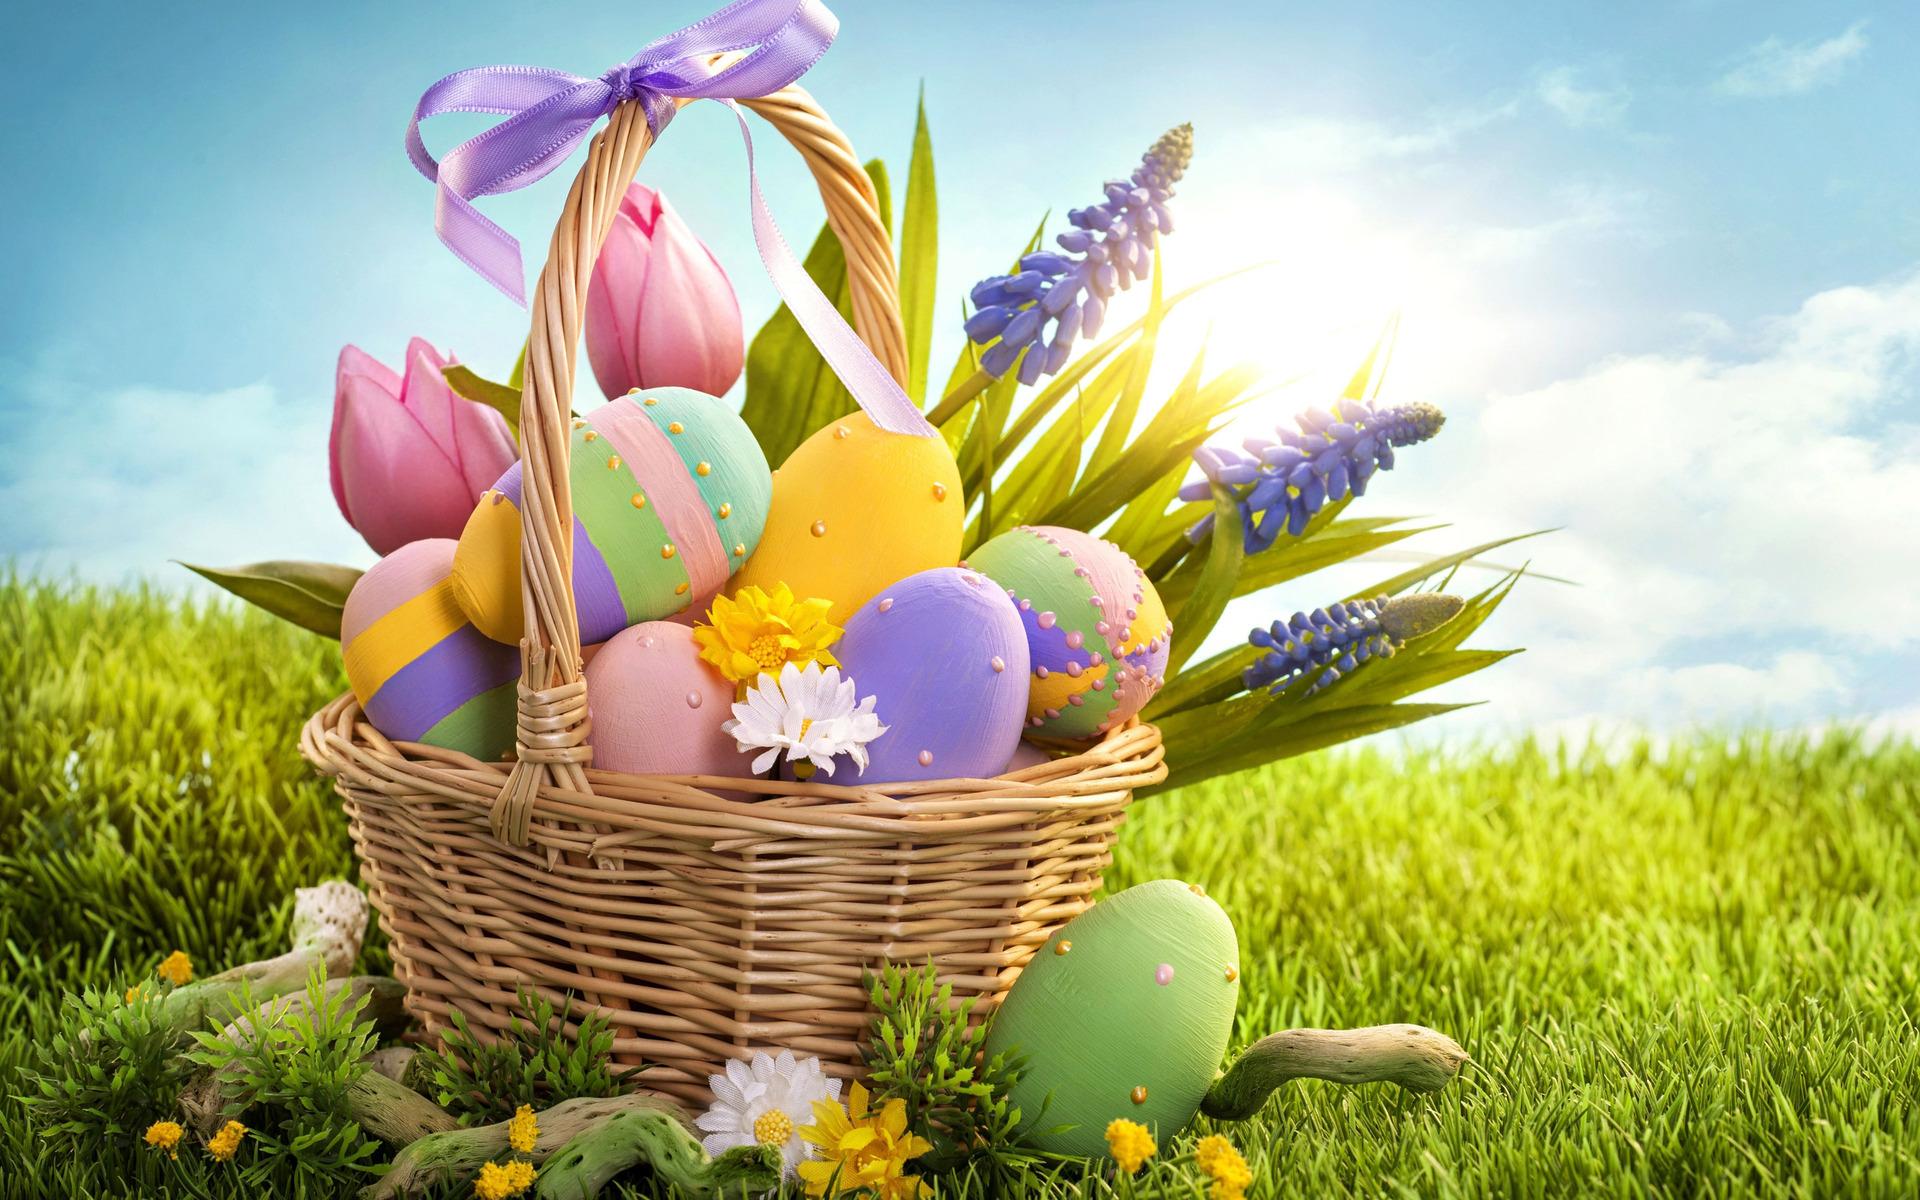 Free Easter Background - WallpaperSafari